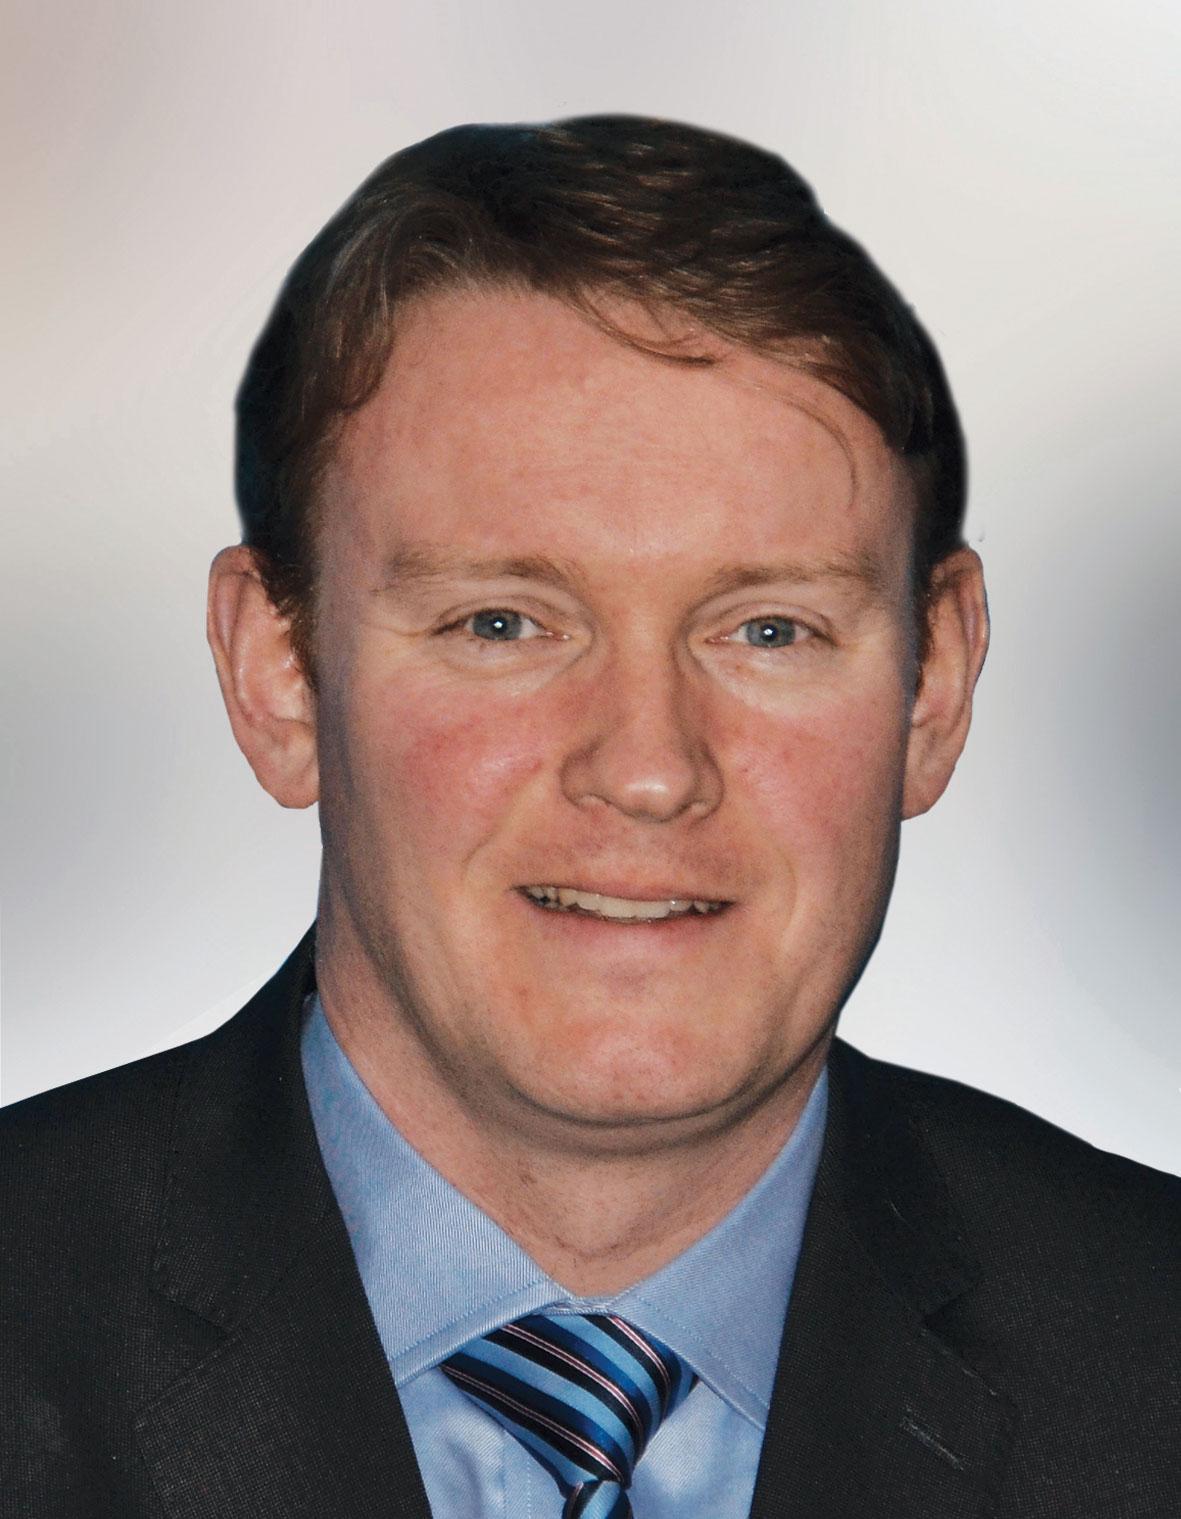 Councillor Micheál Carrigy